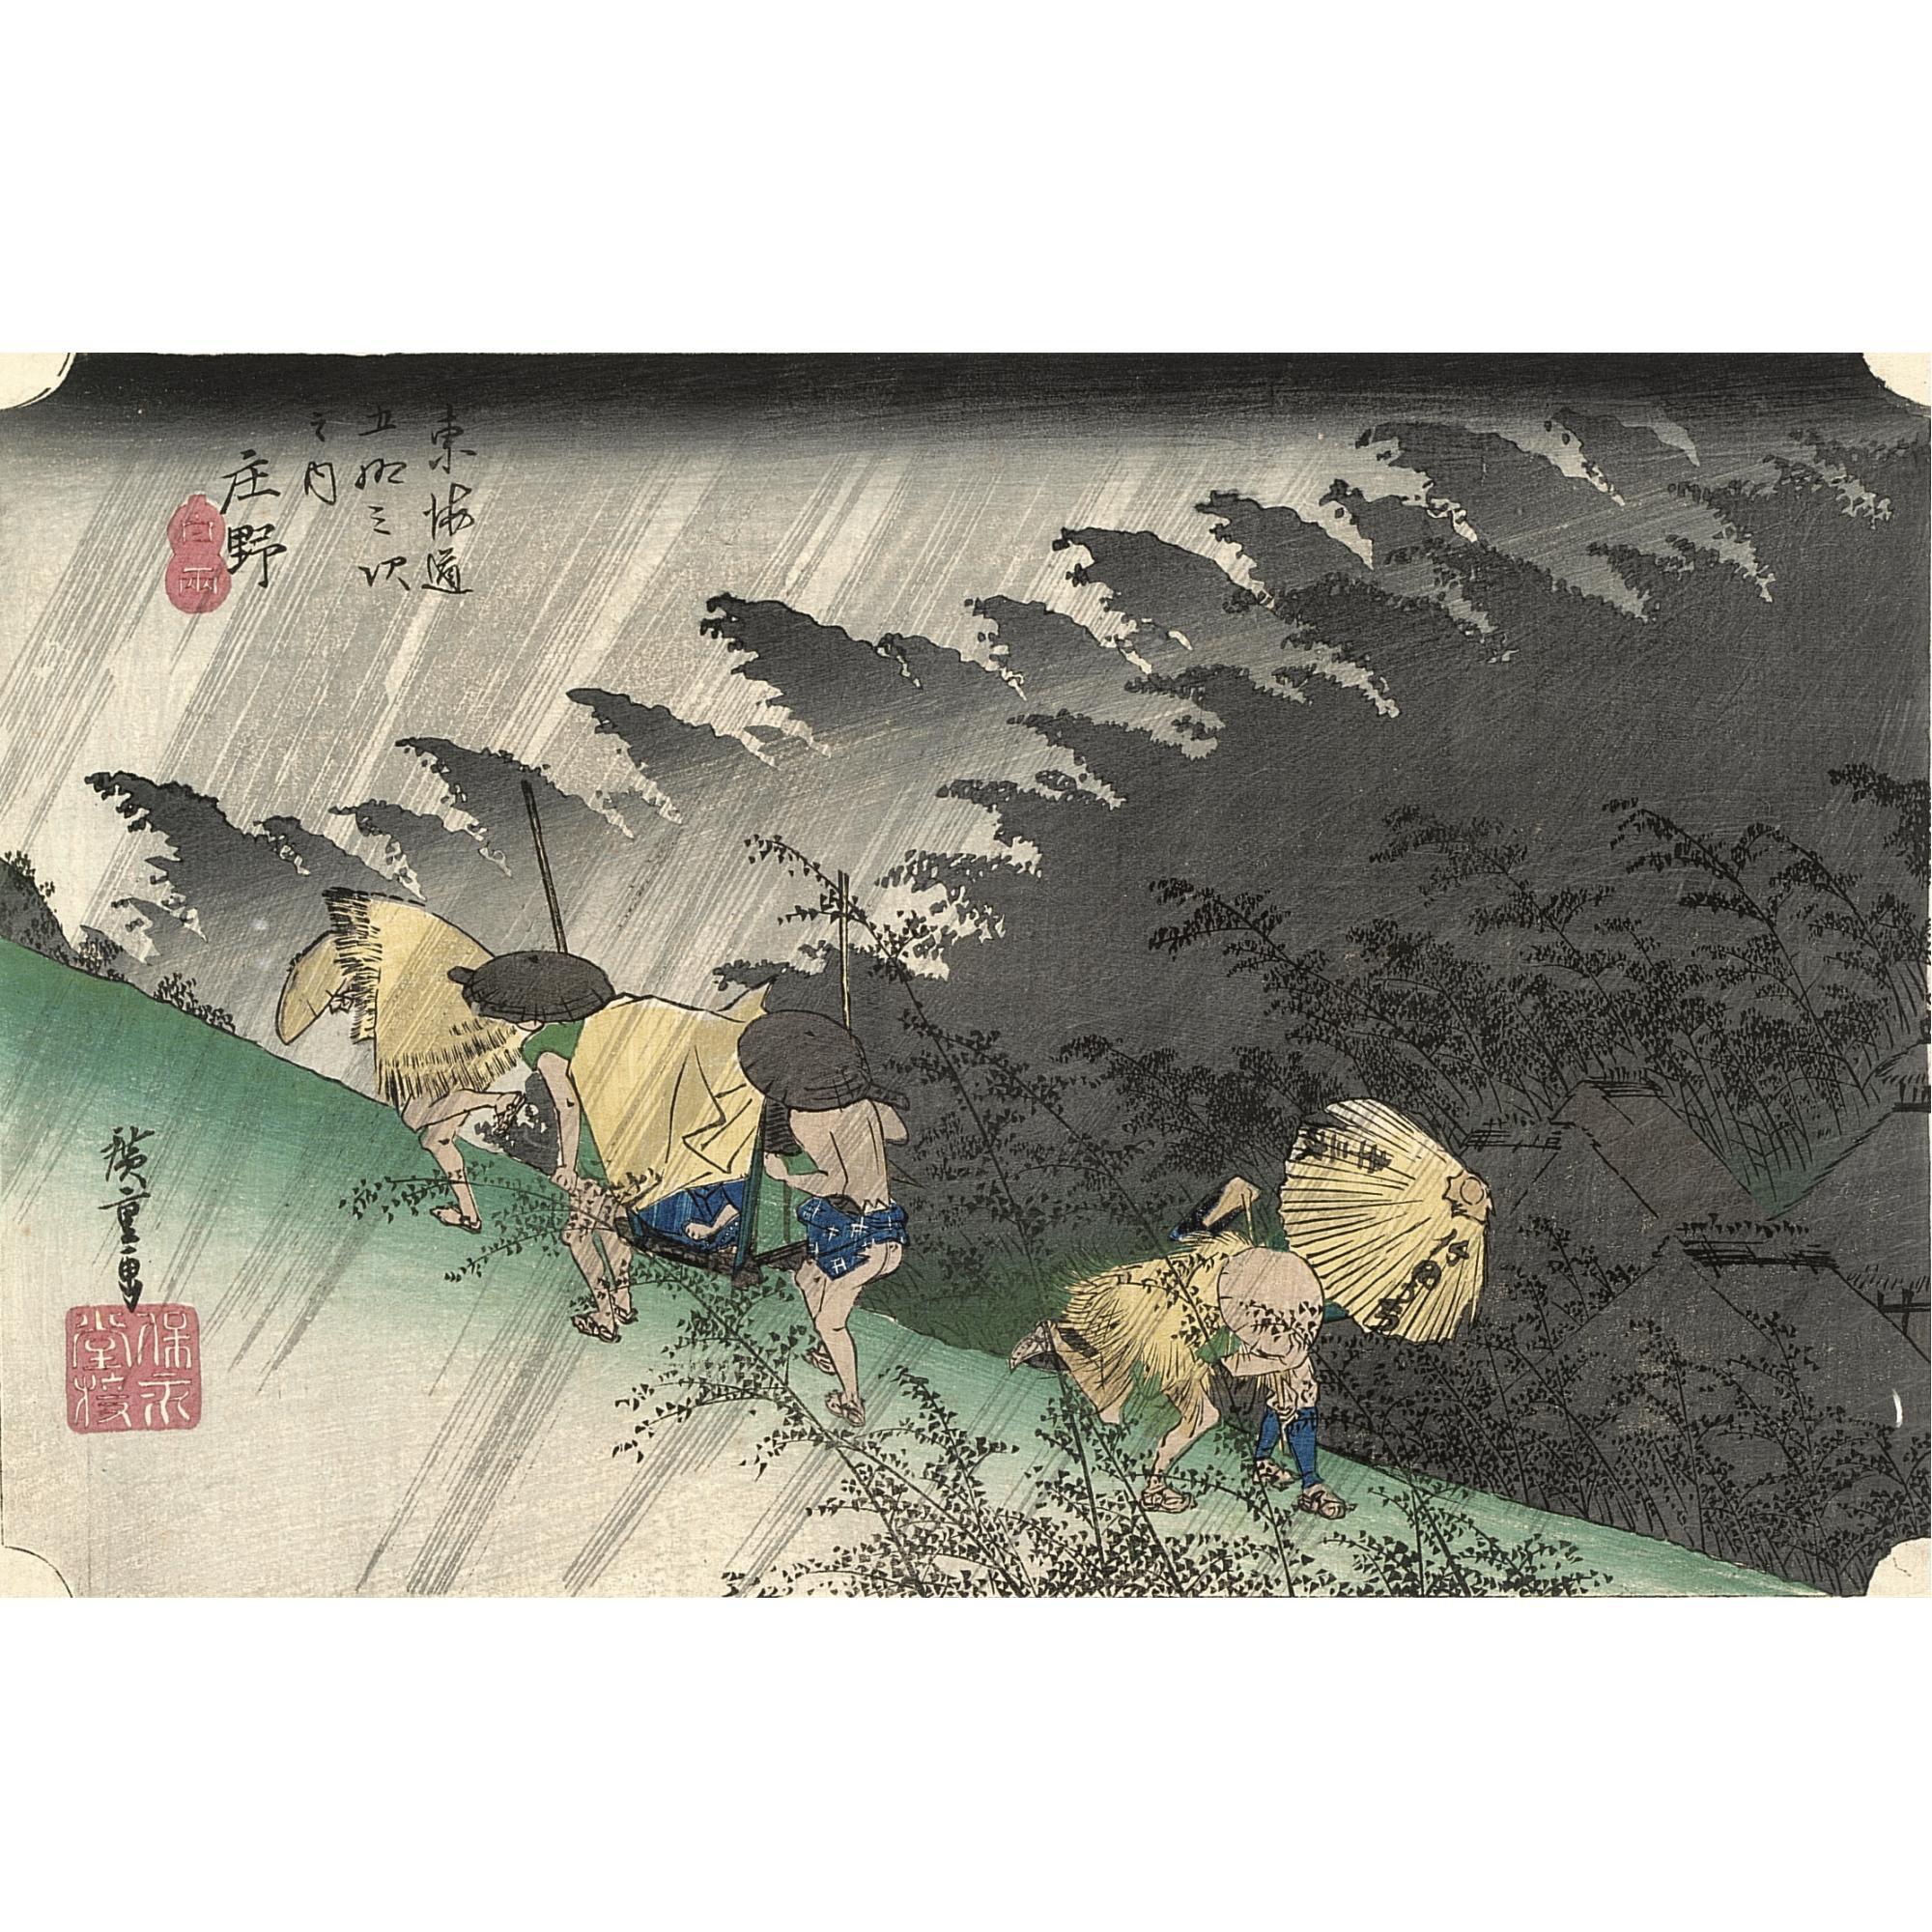 hiroshige BIKUNI BRIDGE IN THE SNOW fine arts poster 1858 24X36 japanese